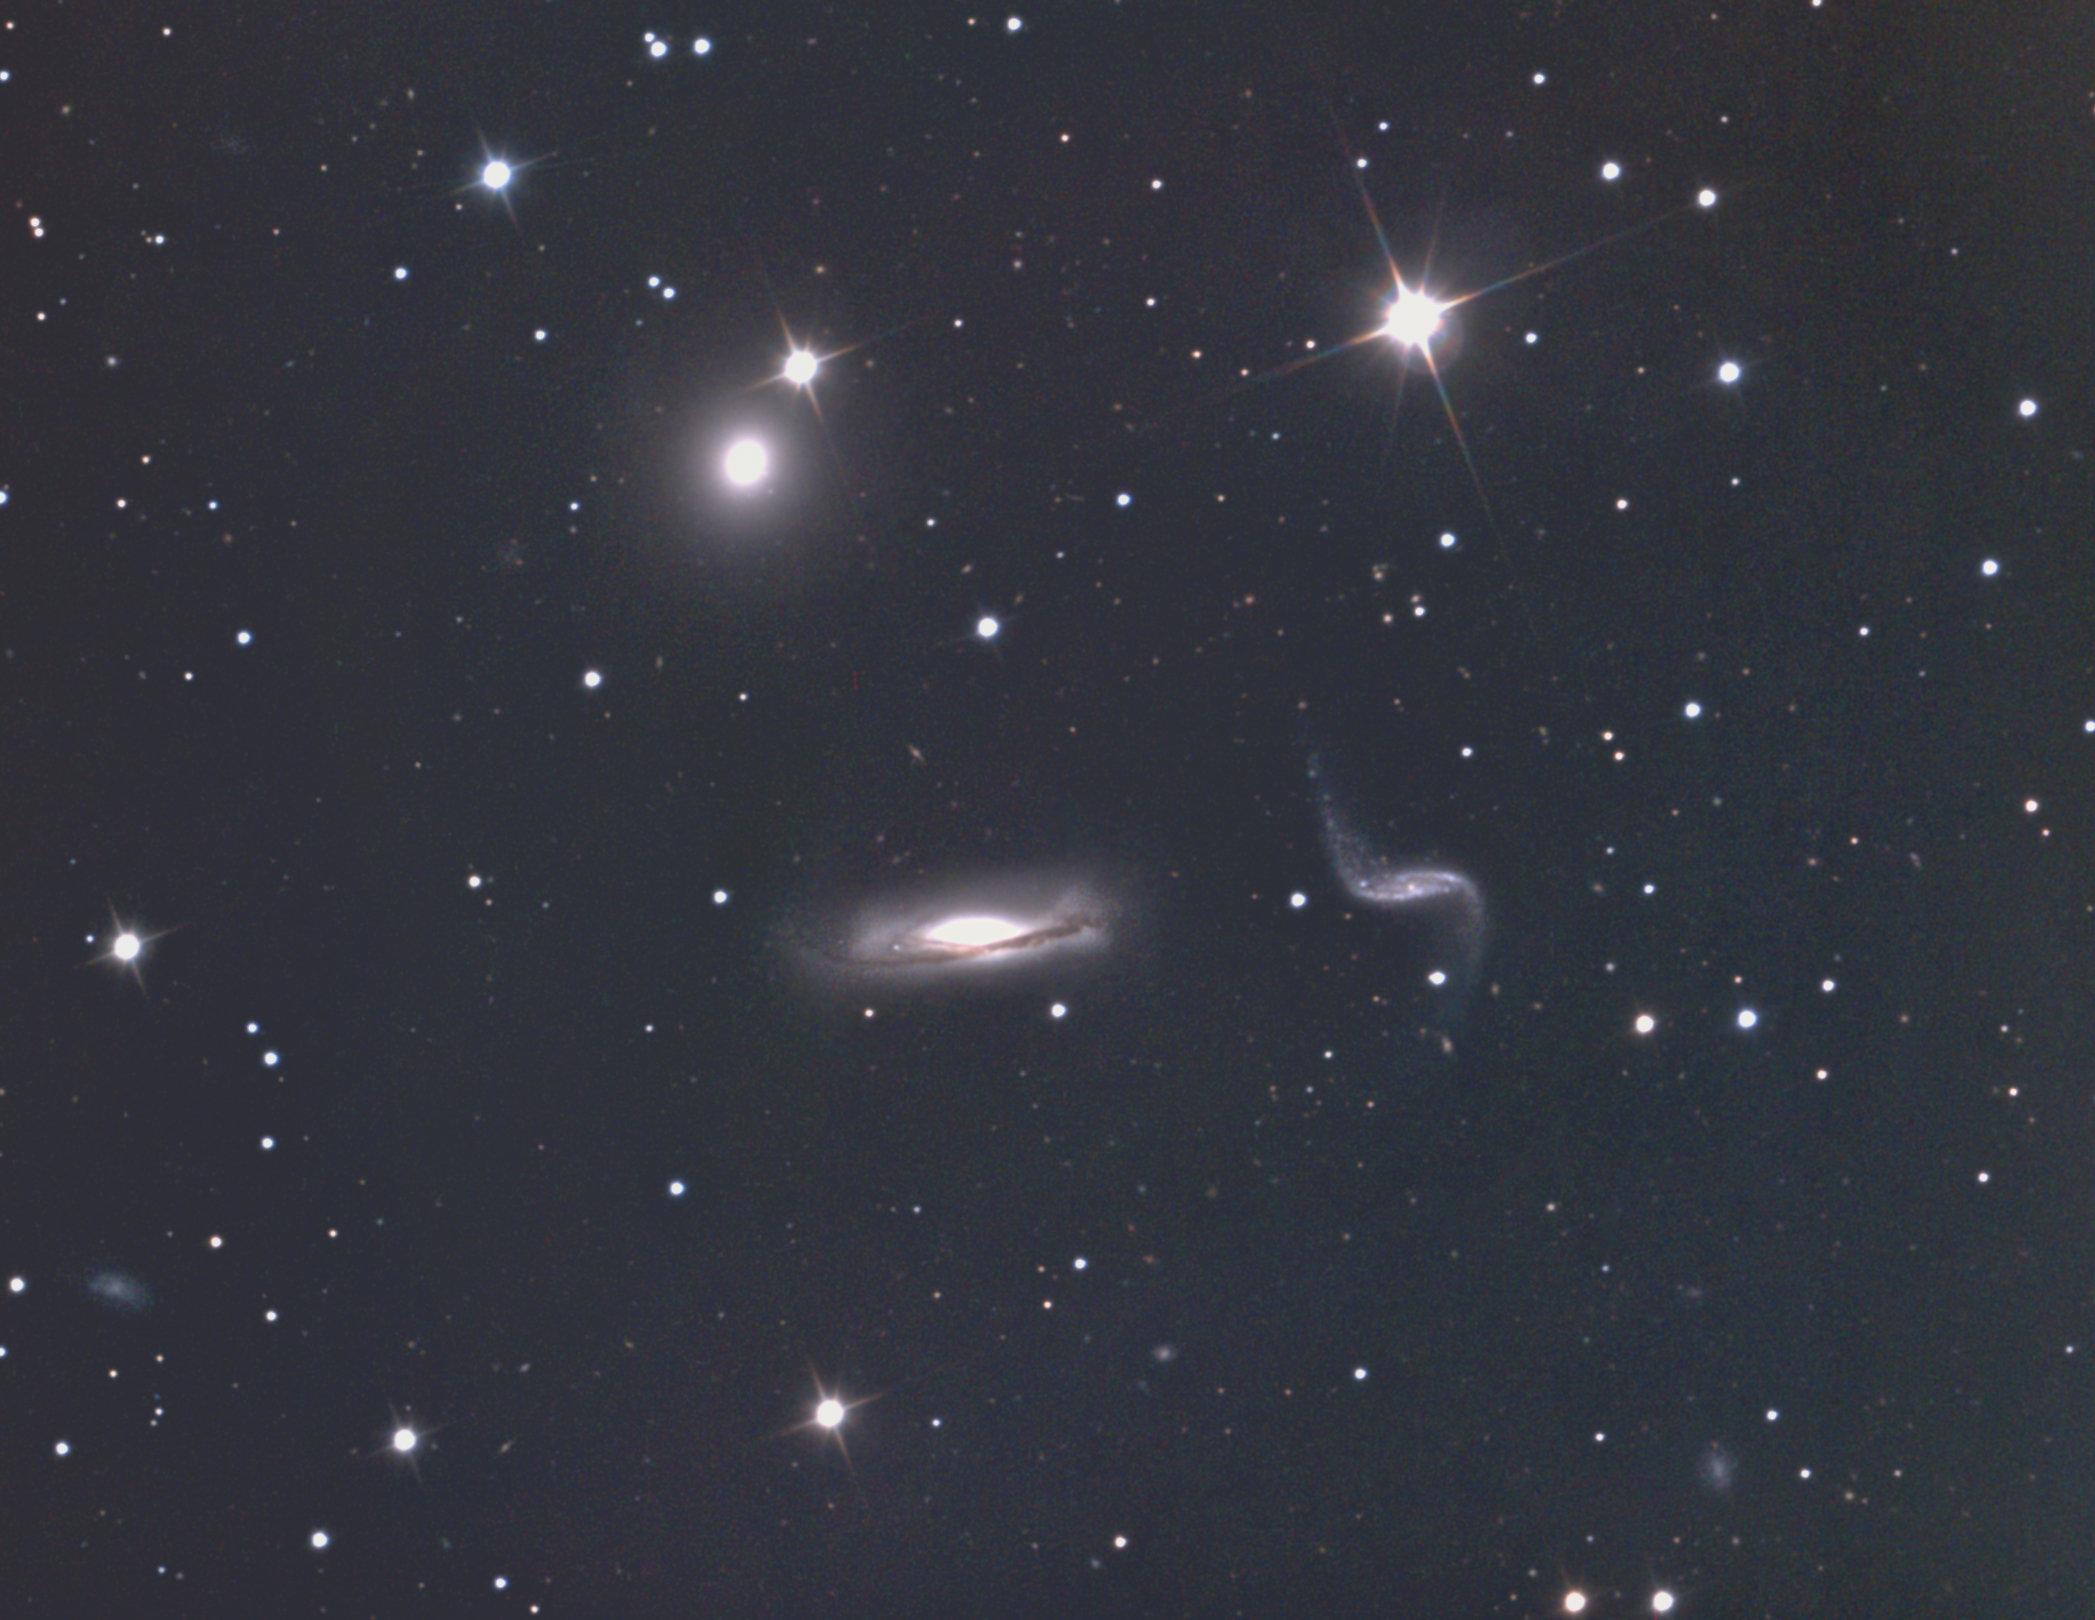 NGC3190 - Antoni Vidal